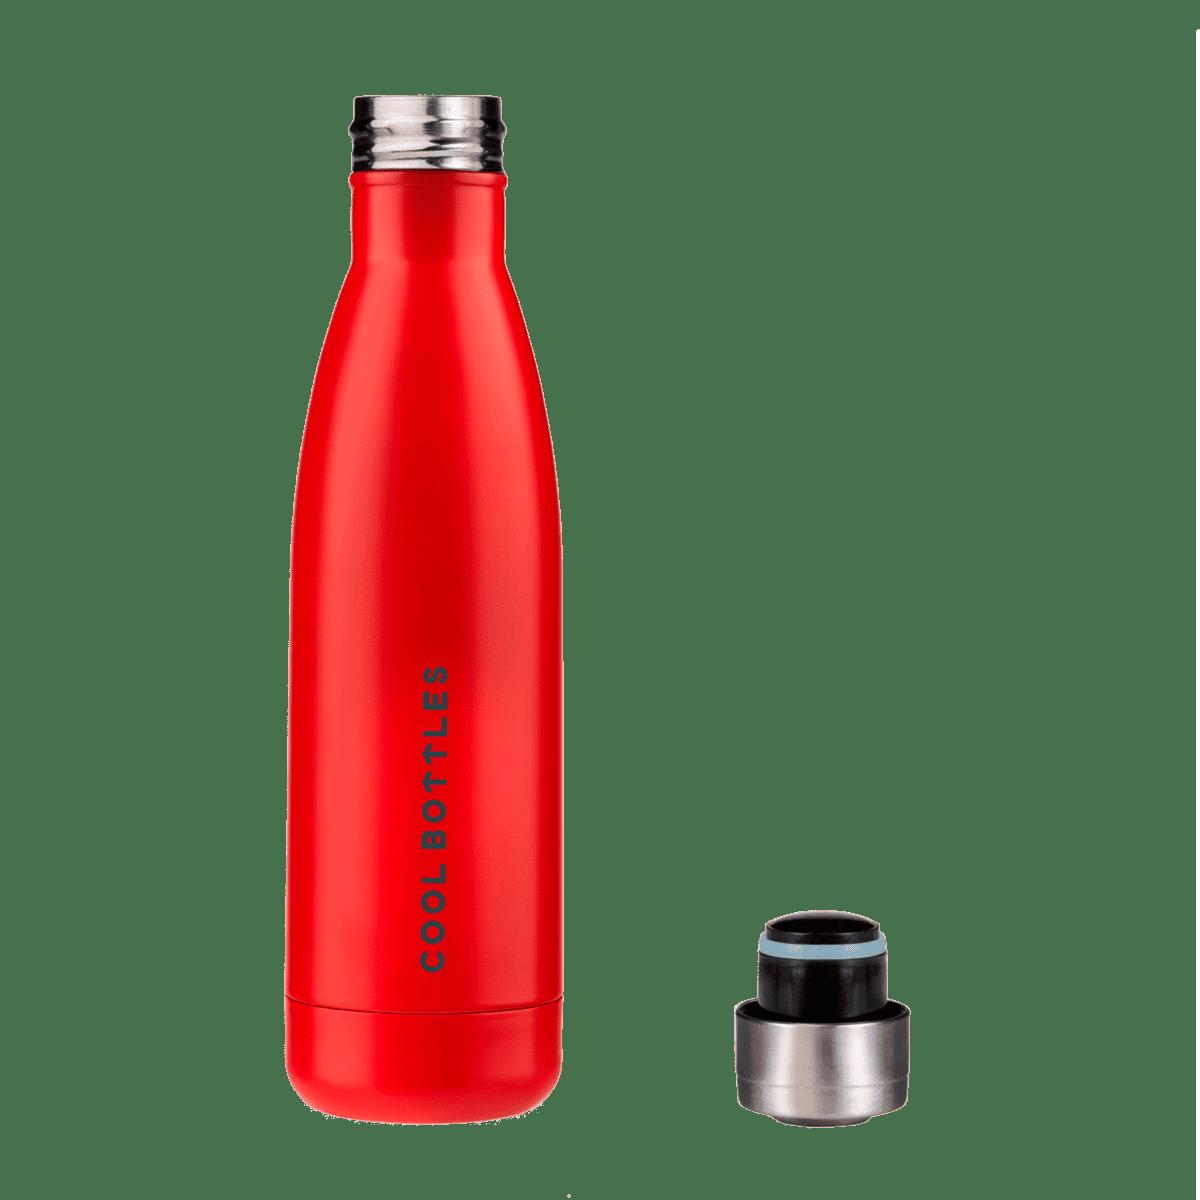 Vivid_Red-cool-bottles-01